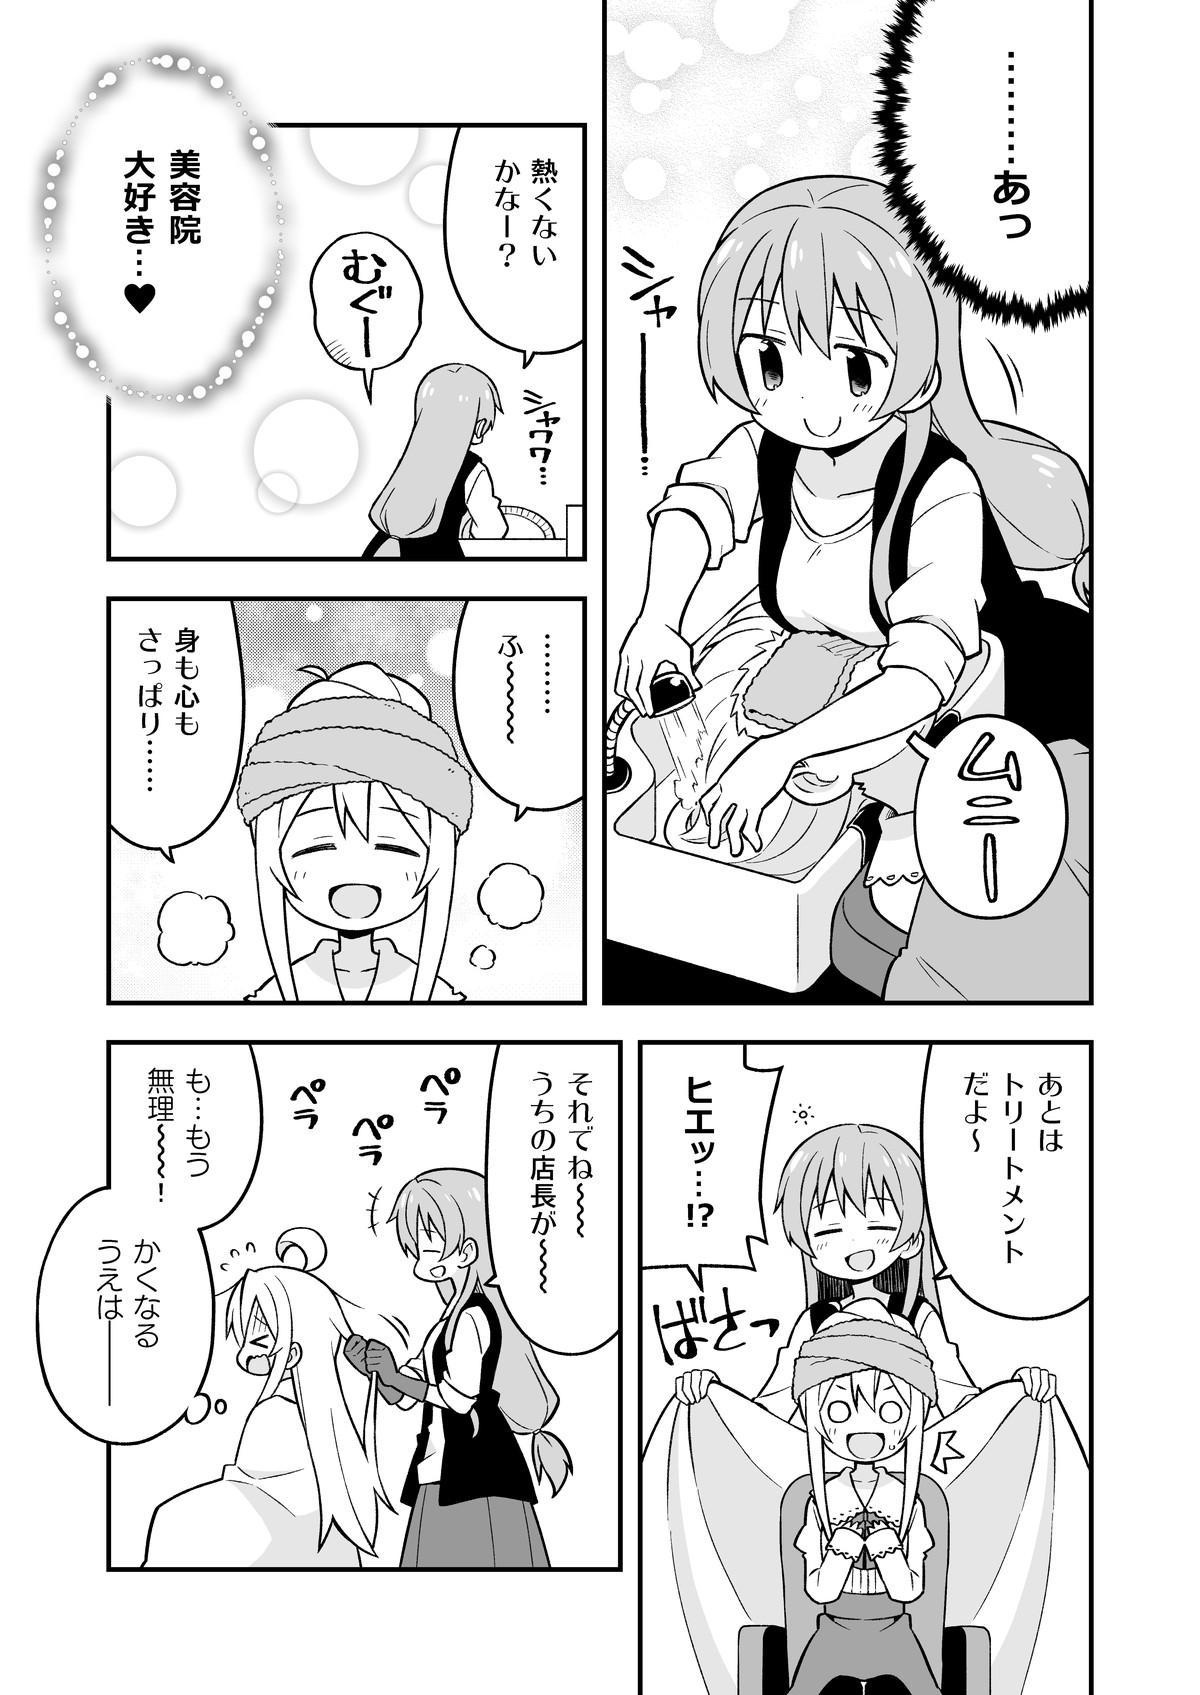 Onii-chan wa Oshimai! 6 7